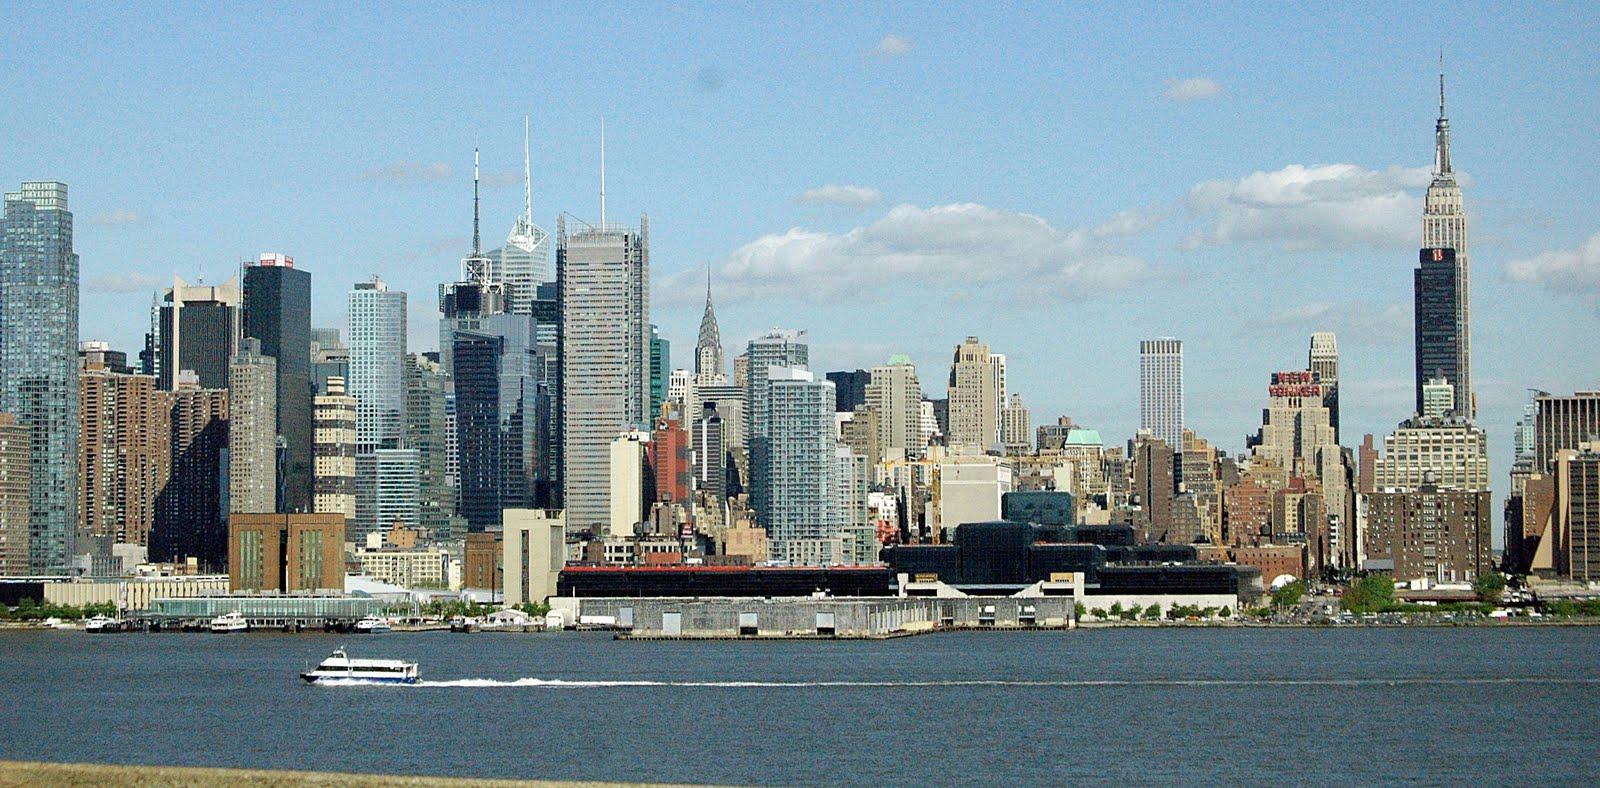 york city skyline day - photo #11